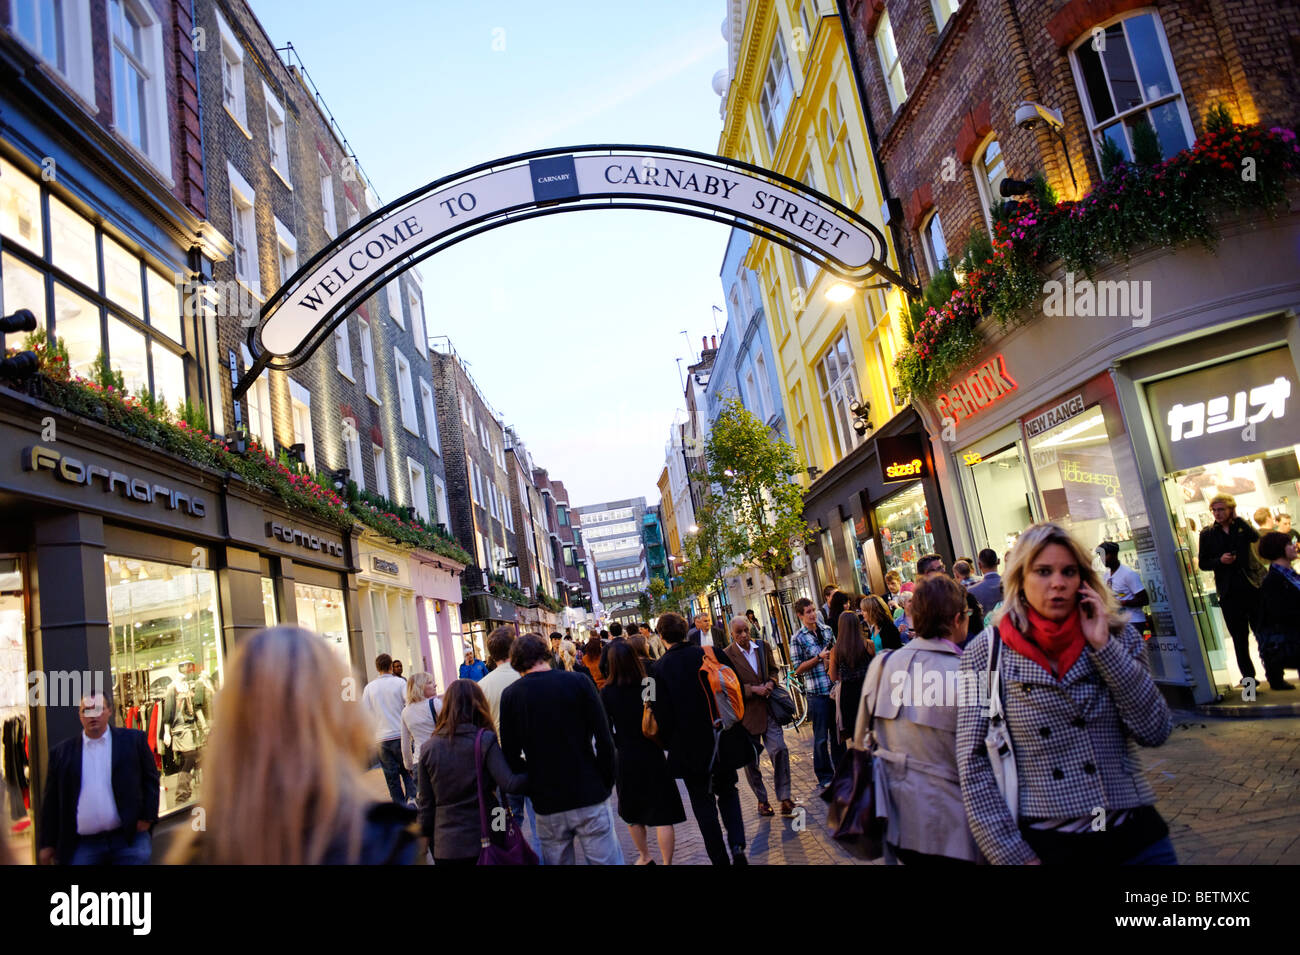 Carnaby street. London. Britain. UK - Stock Image